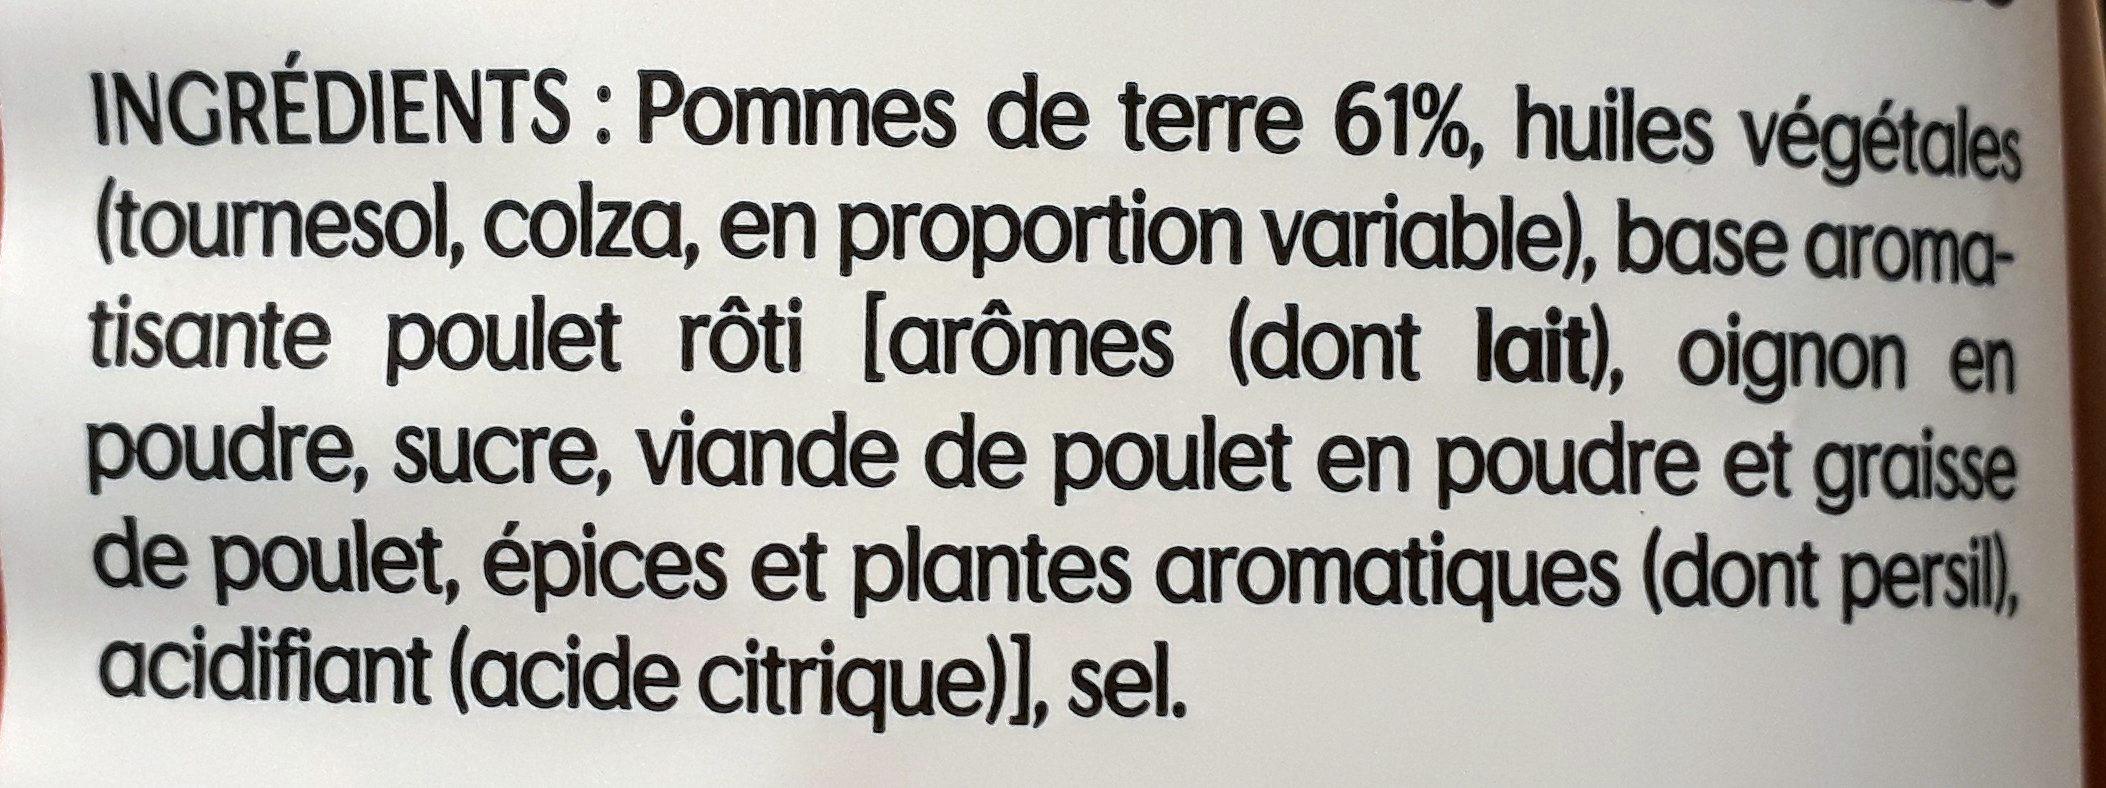 Saveur Poulet Rôti - Inhaltsstoffe